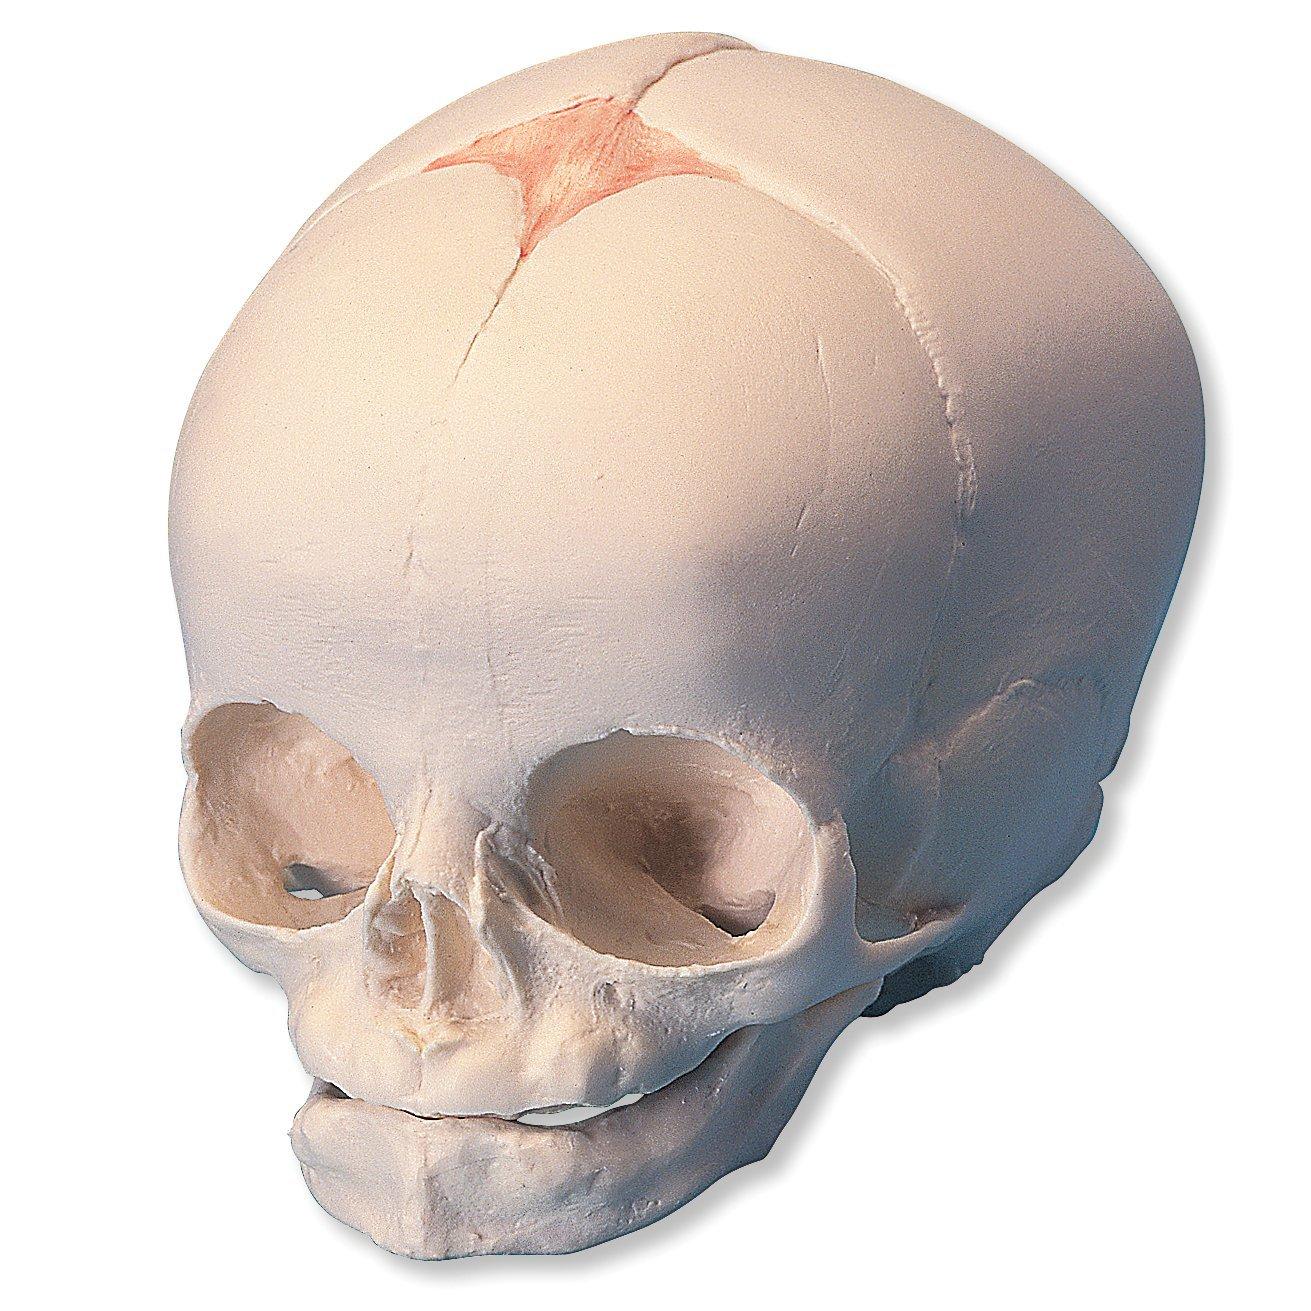 3B Scientific A25 30th Week of Pregnancy Natural Cast Fetal Skull Model, 5.5' x 3.5' x 3.5'